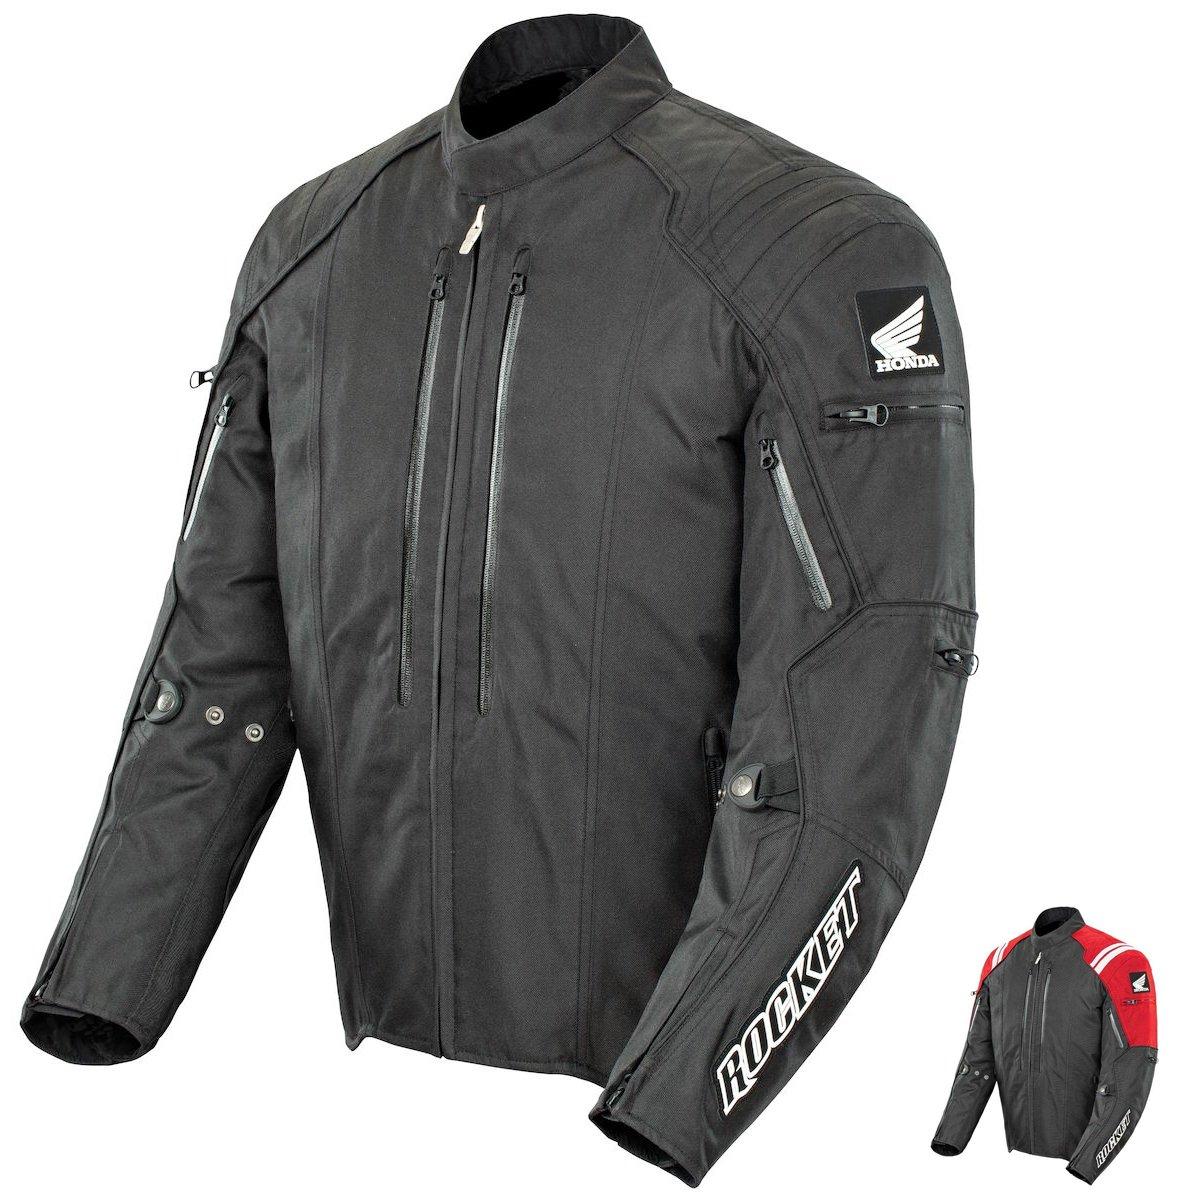 Amazon.com: Joe Rocket Honda CBR Men's Textile Street Racing Motorcycle  Jacket - Black/Black / 2X-Large: Automotive